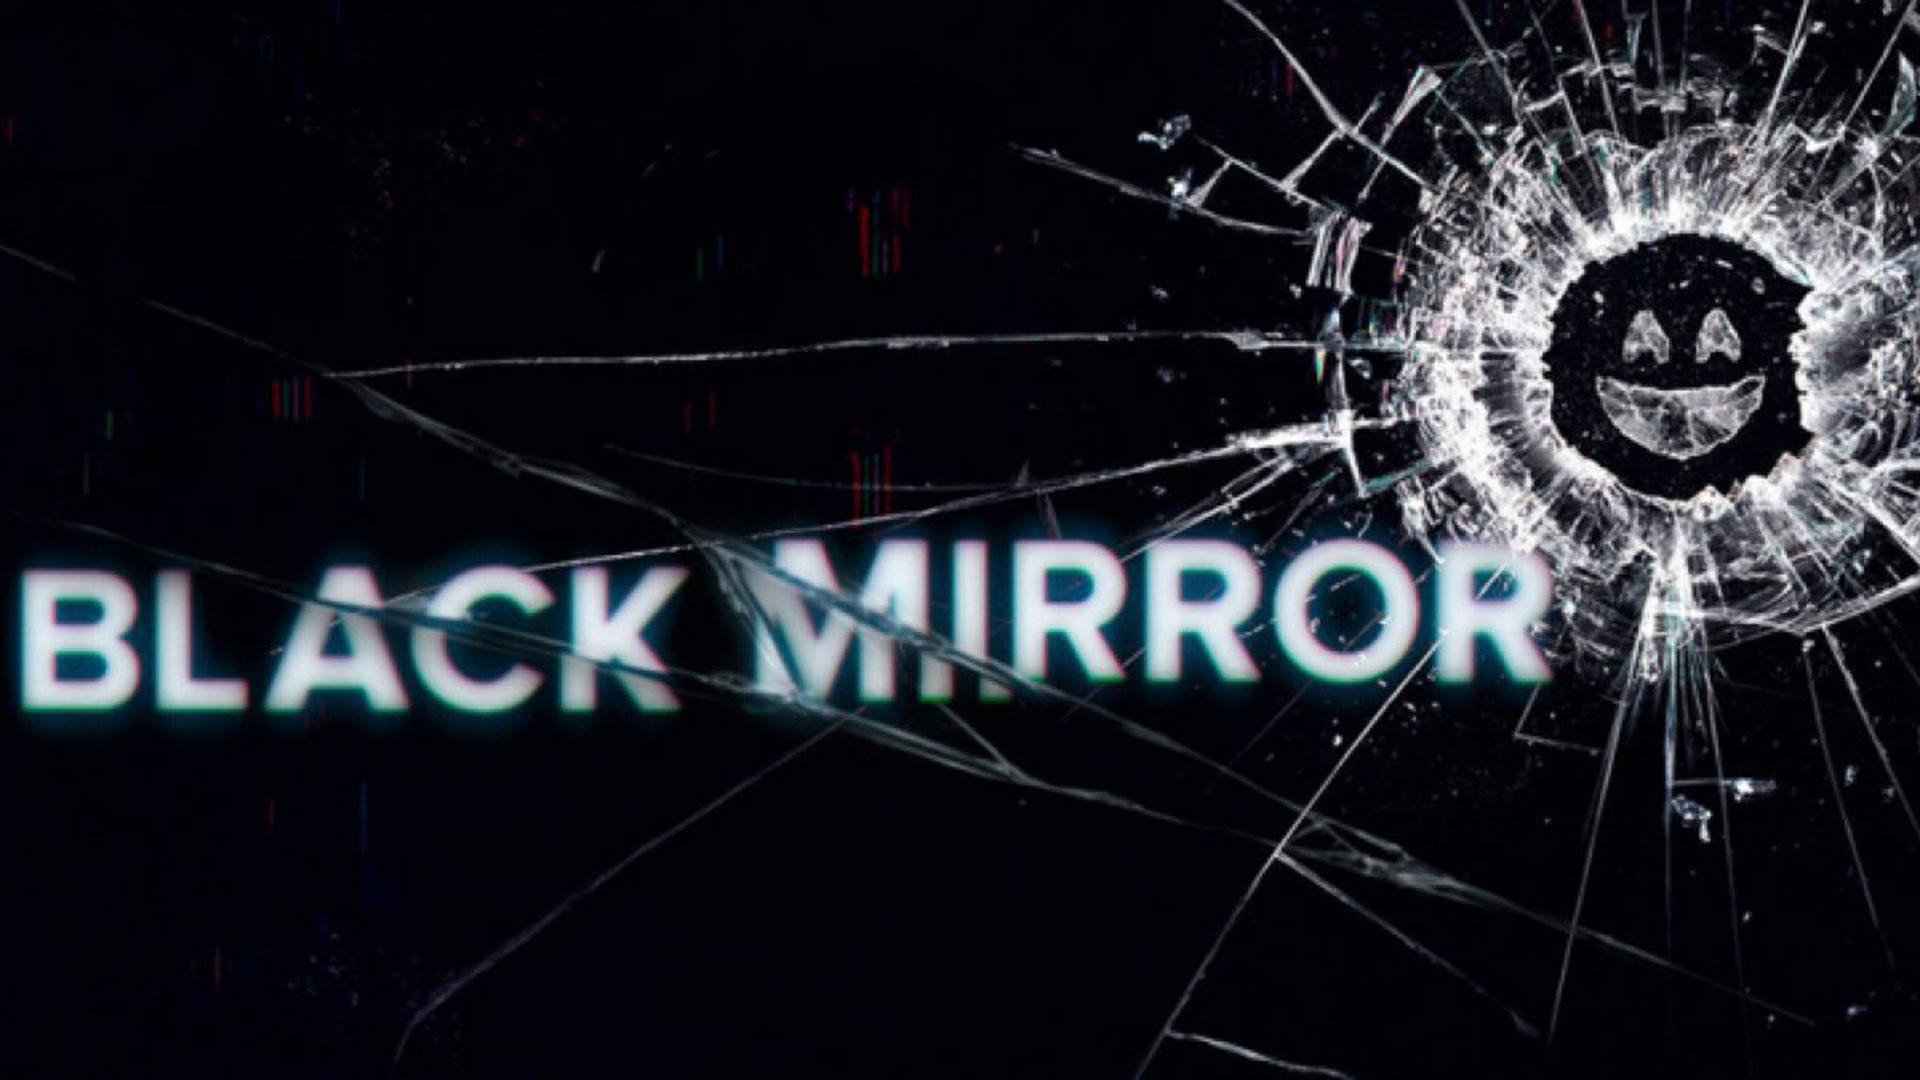 Black Mirror Wallpapers Season 6 Black Mirror 1920x1080 Download Hd Wallpaper Wallpapertip